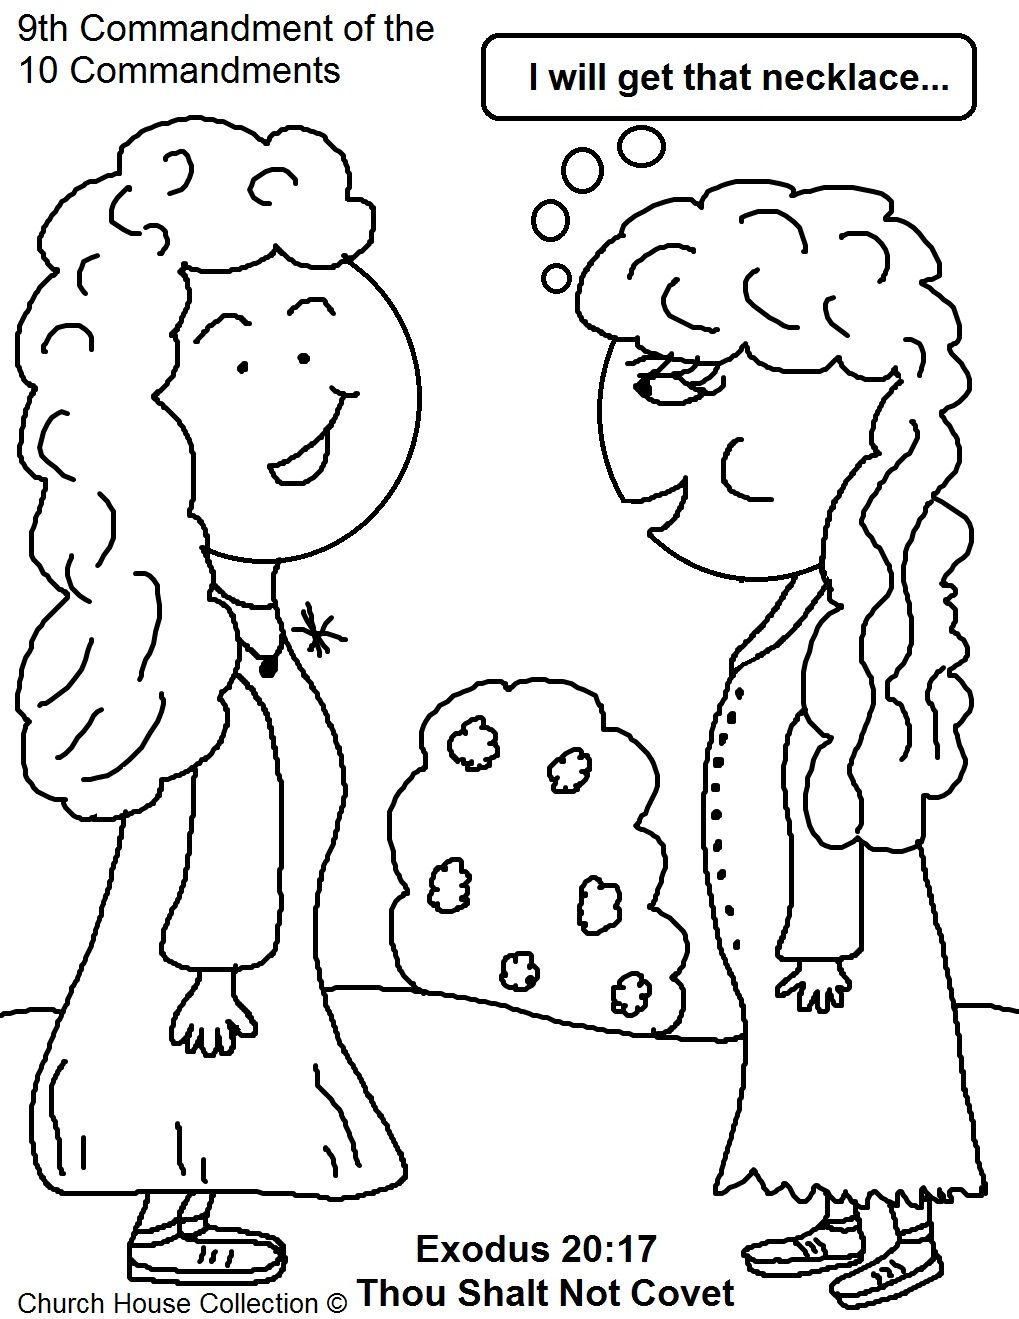 Commandment page ten coloring sheets blog thou shalt not covet coloring page for ten commandments